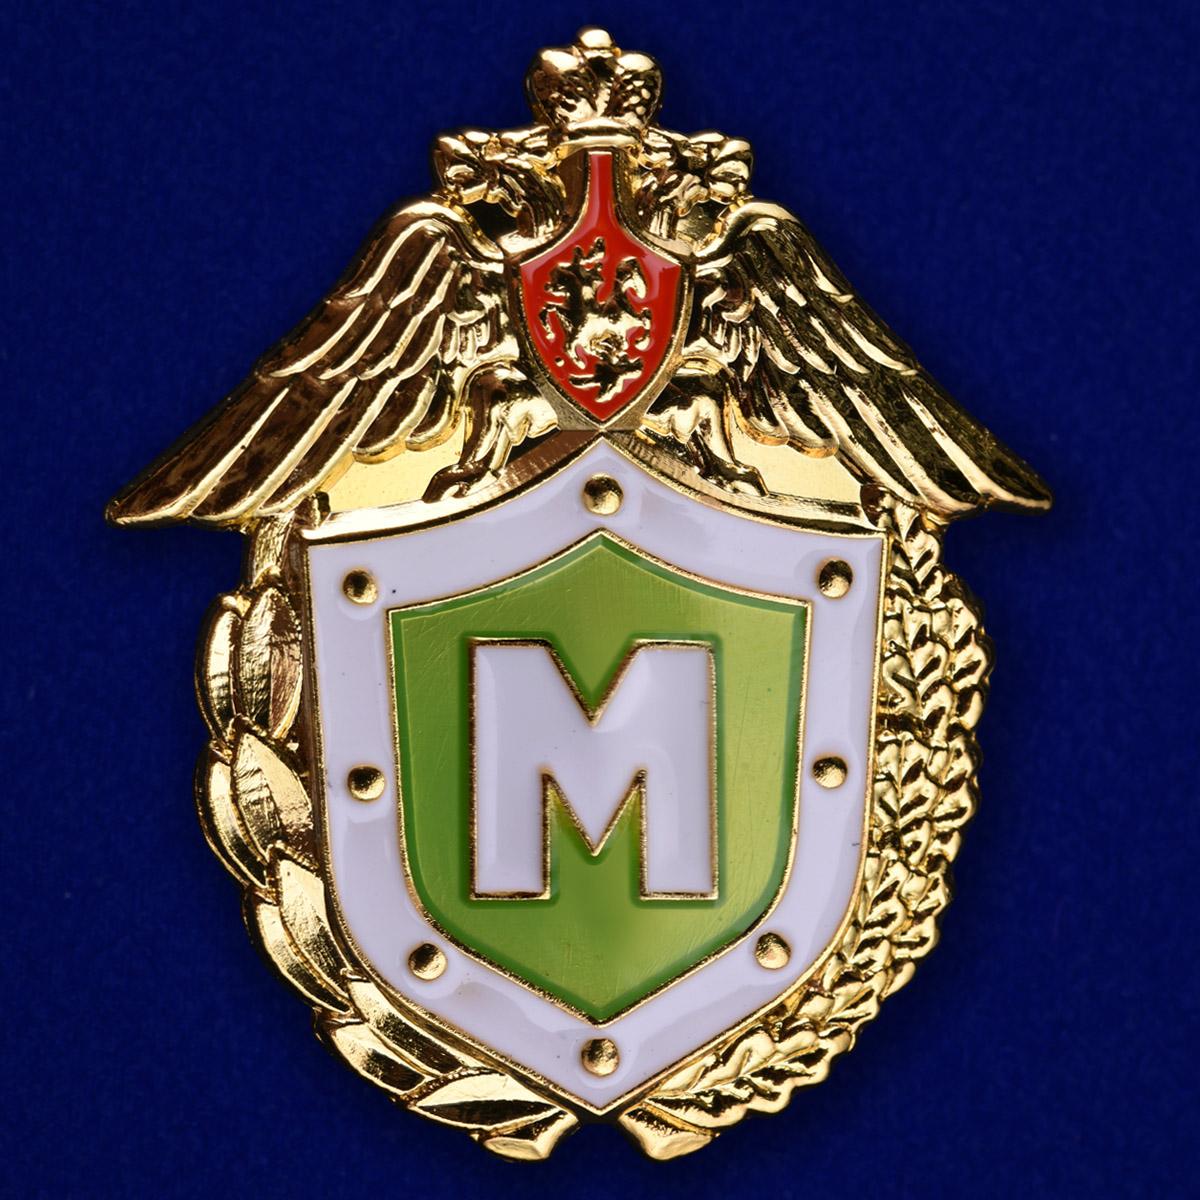 Знак ФПС «Классный специалист» Мастер